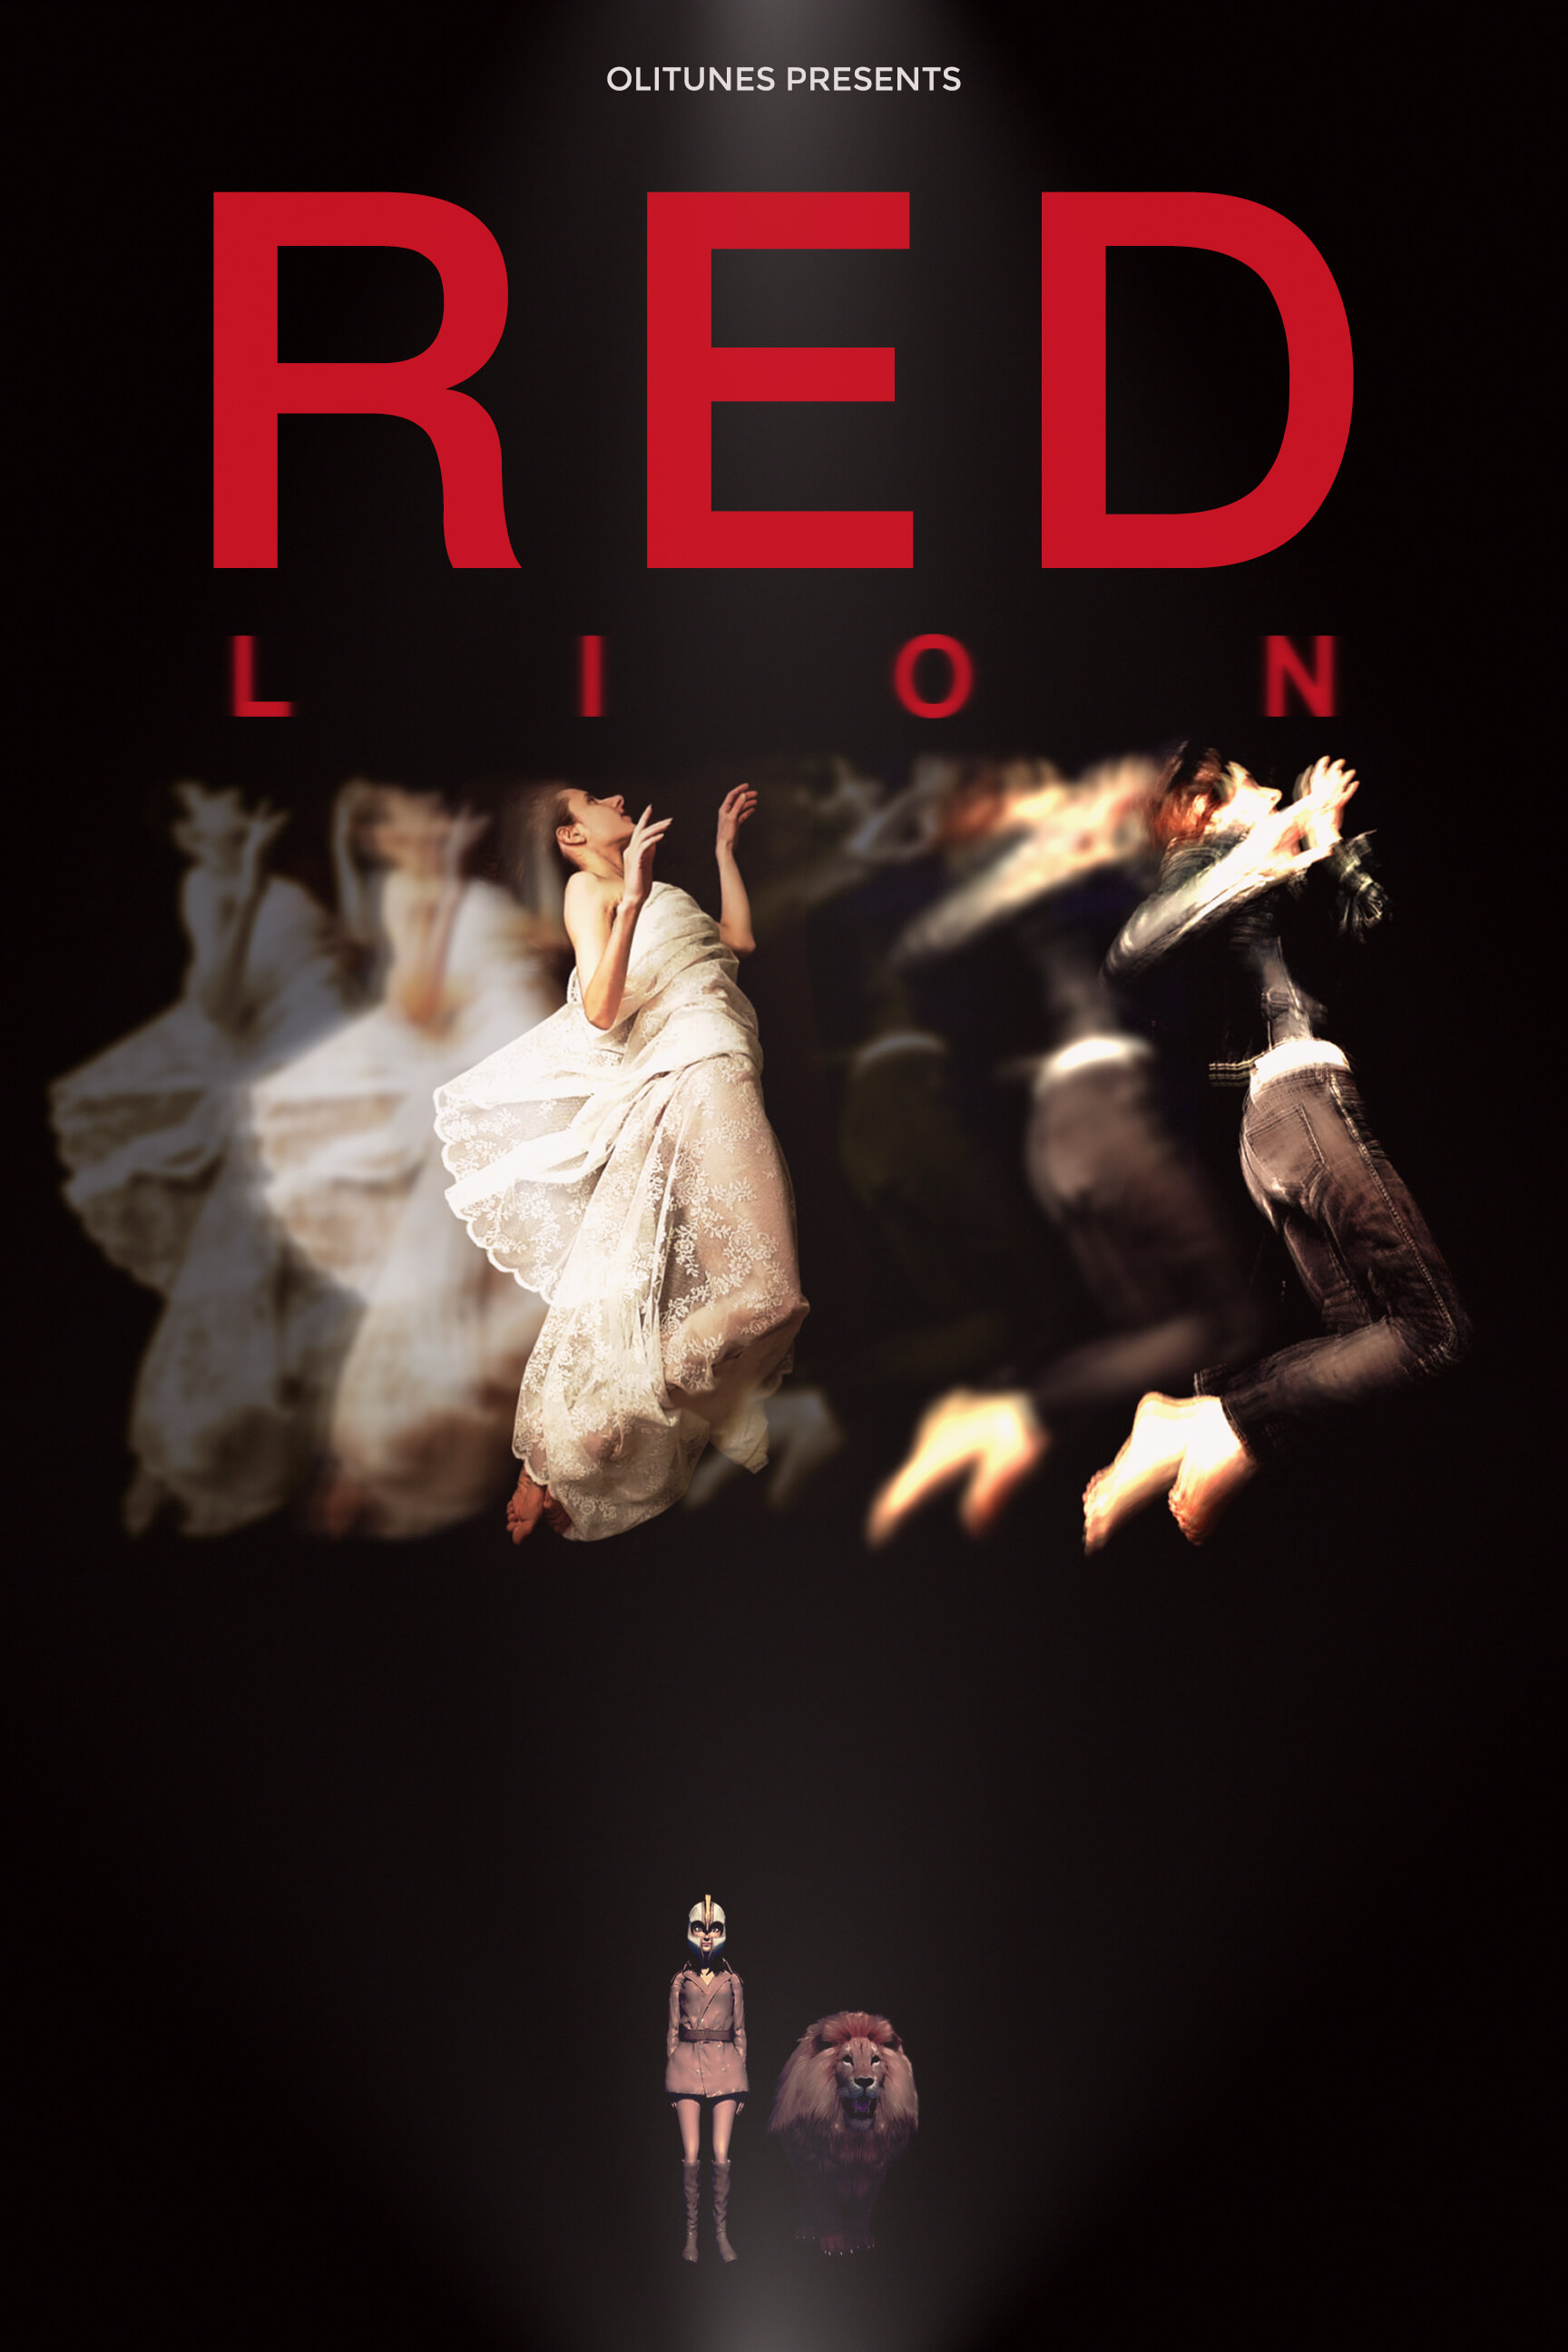 RED LION by Oh. Olivia Hadjiioannou